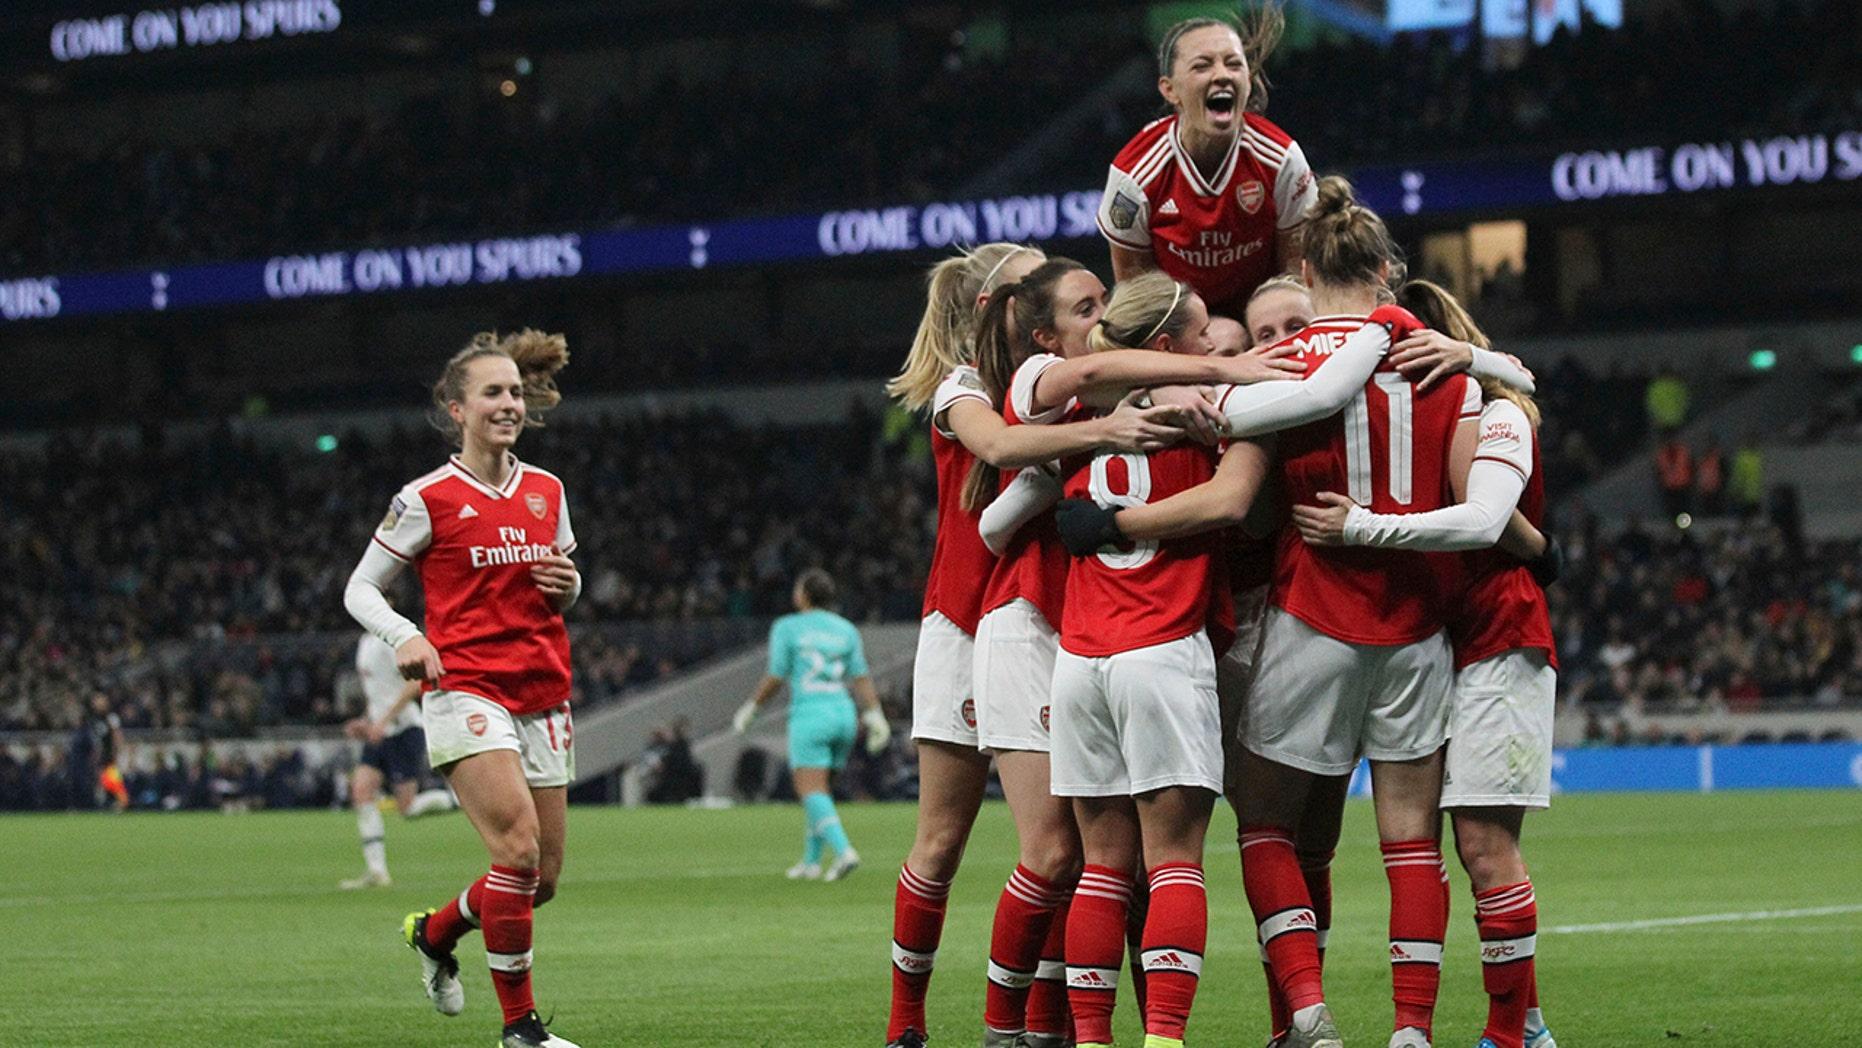 Westlake Legal Group Arsenal-women Record Women's Super League crowd sees Arsenal win at Spurs fox-news/sports/soccer fnc/sports fnc Associated Press article 392bcdb8-74a0-5e6d-852d-490d10168836